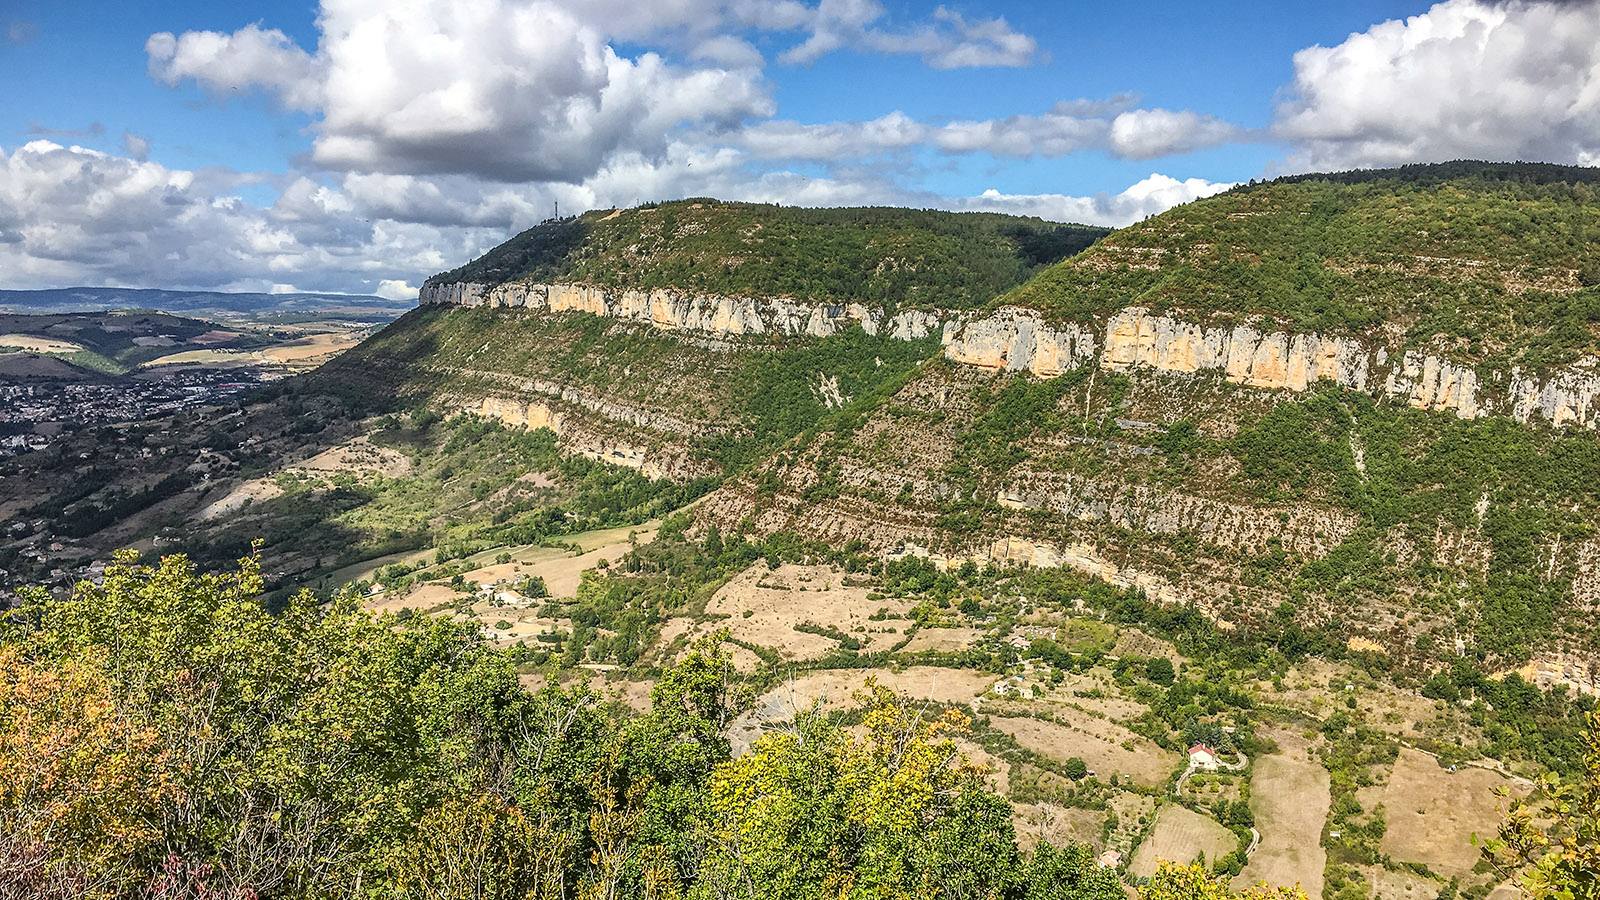 Gorges du Tarn bei Millau. Foto: Hilke Maunder